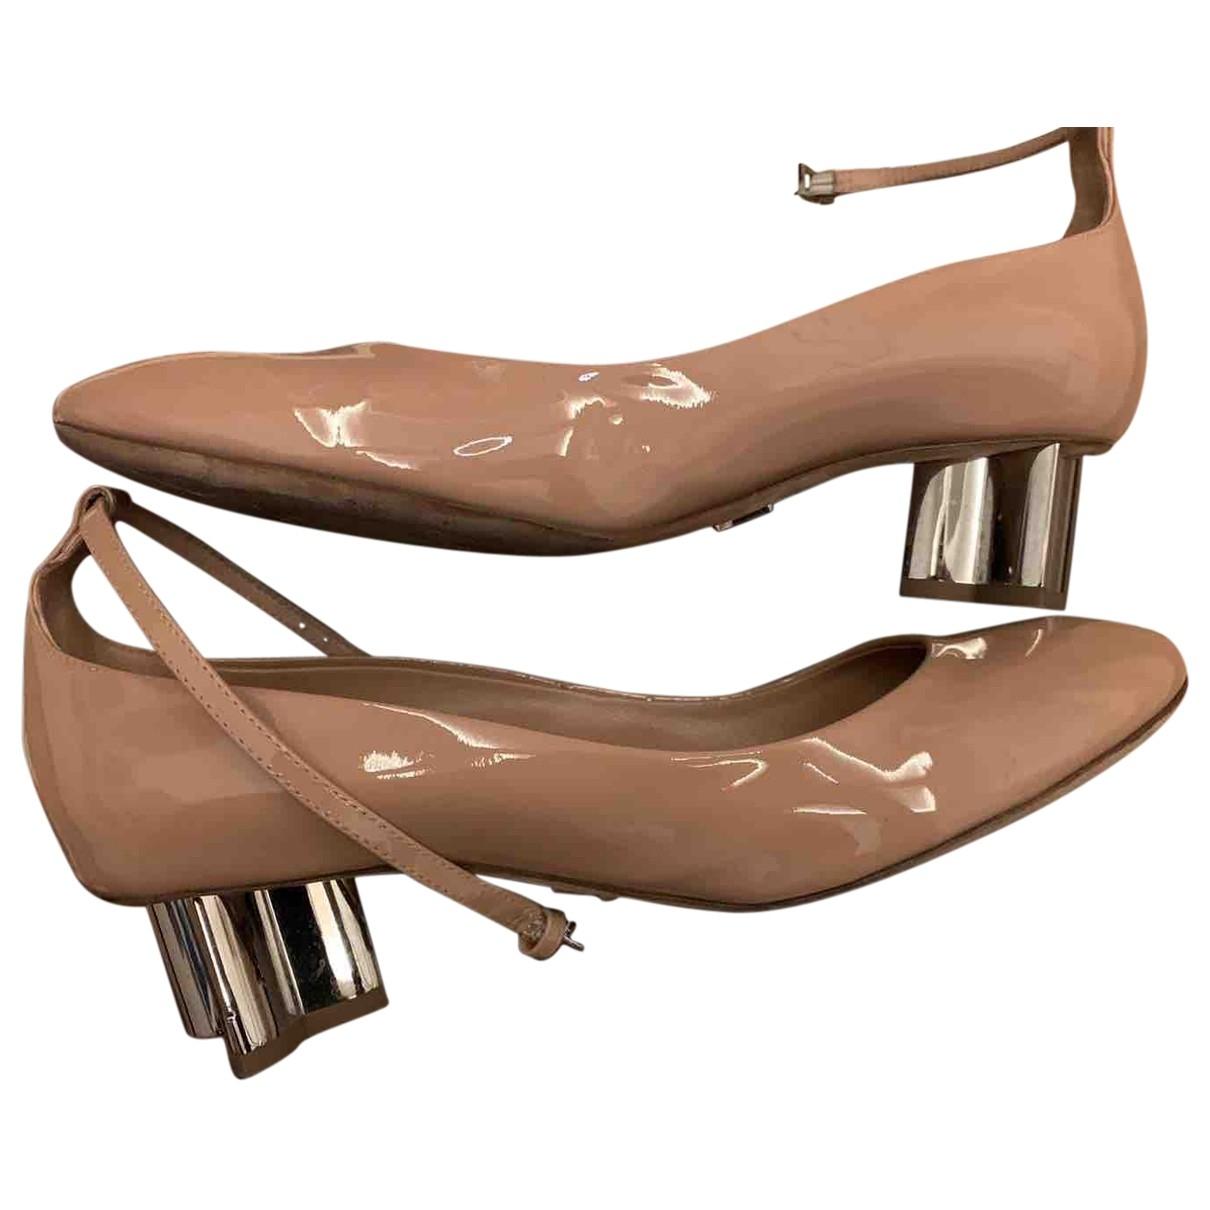 Louis Vuitton \N Pink Patent leather Ballet flats for Women 39.5 EU